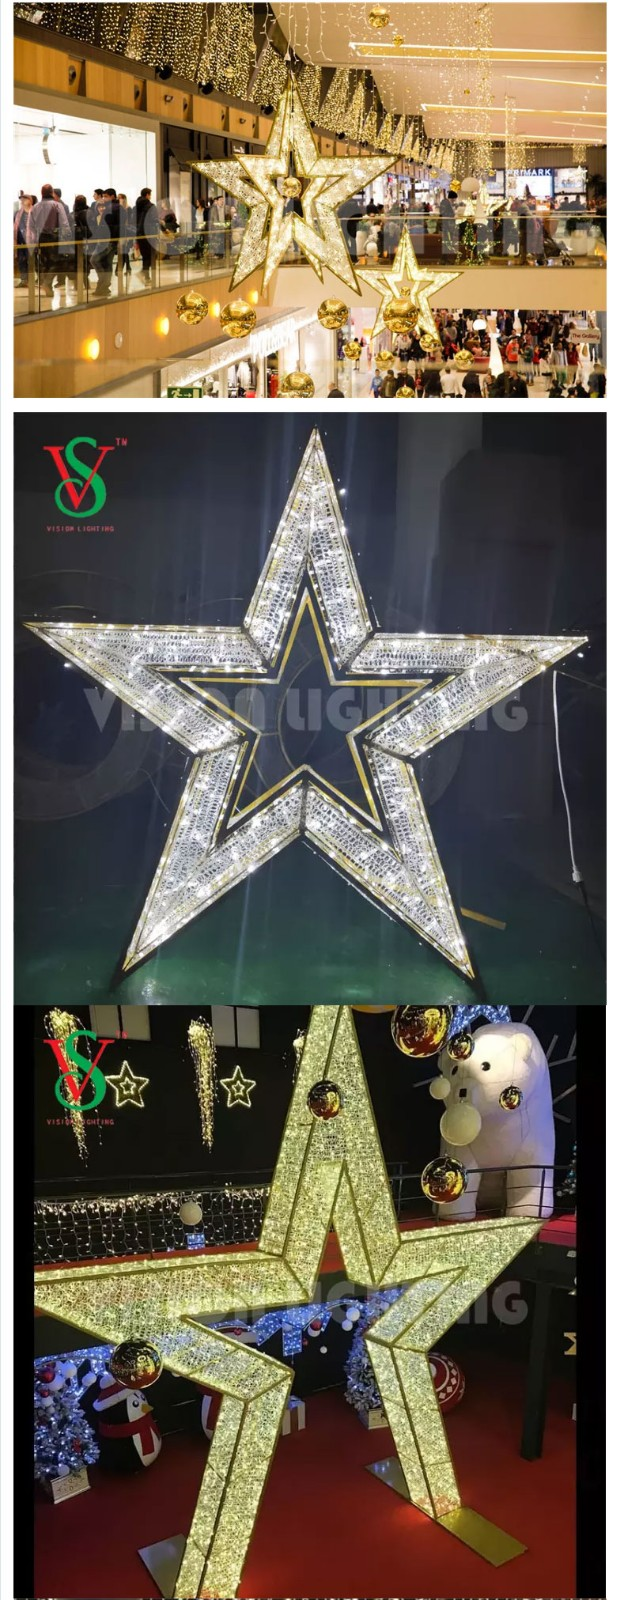 Christmas Displays Decorative Illuminated Motif Lights